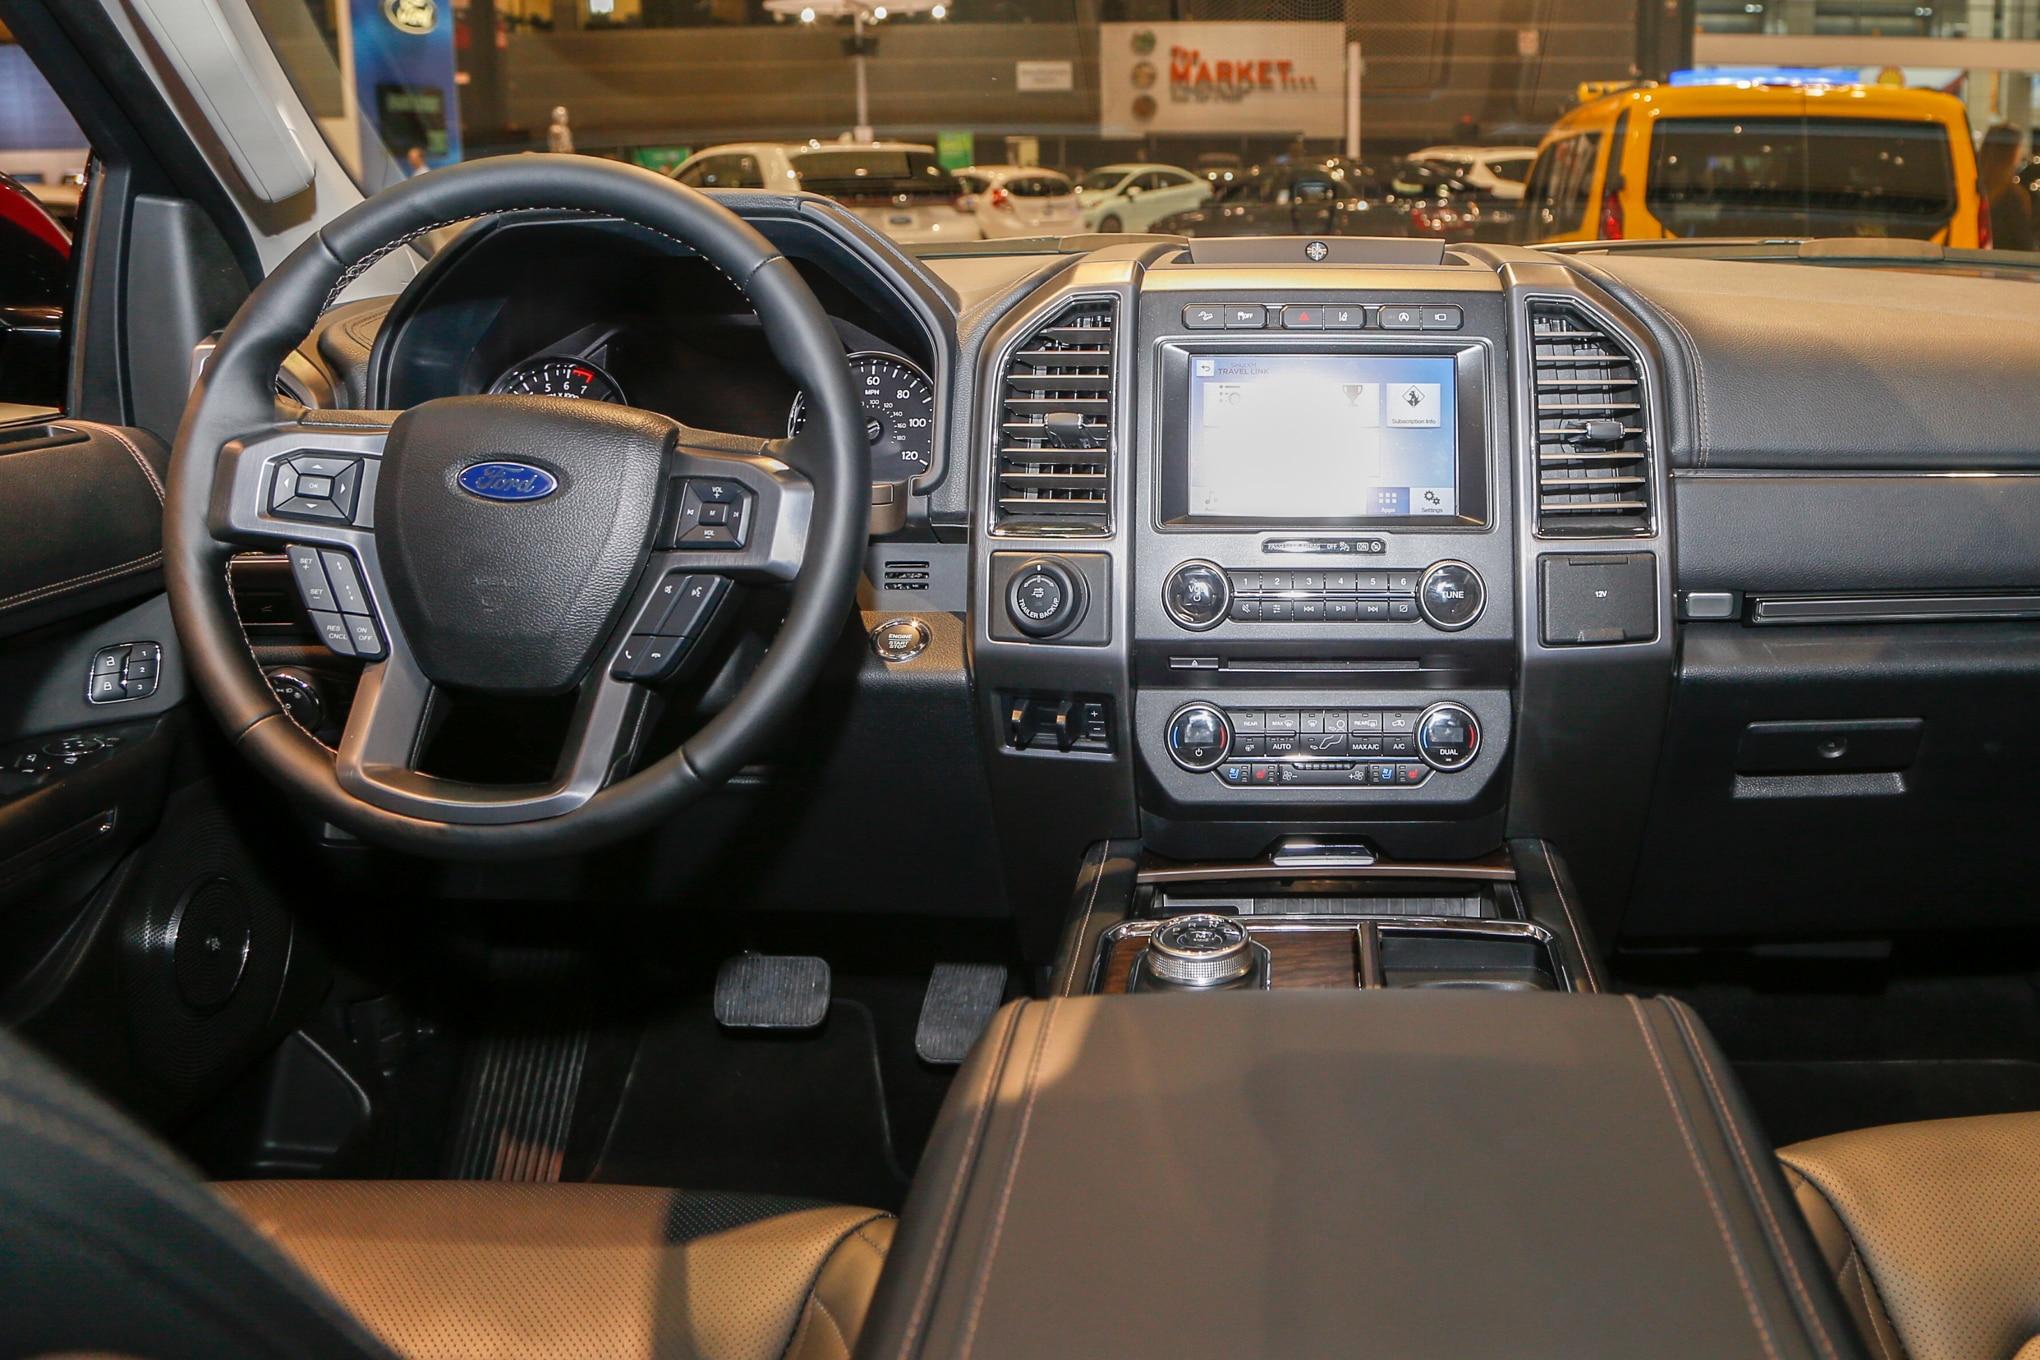 2018 Ford Expedition Platinum Interior 02 9 Febrero 2017 Carol Ngo